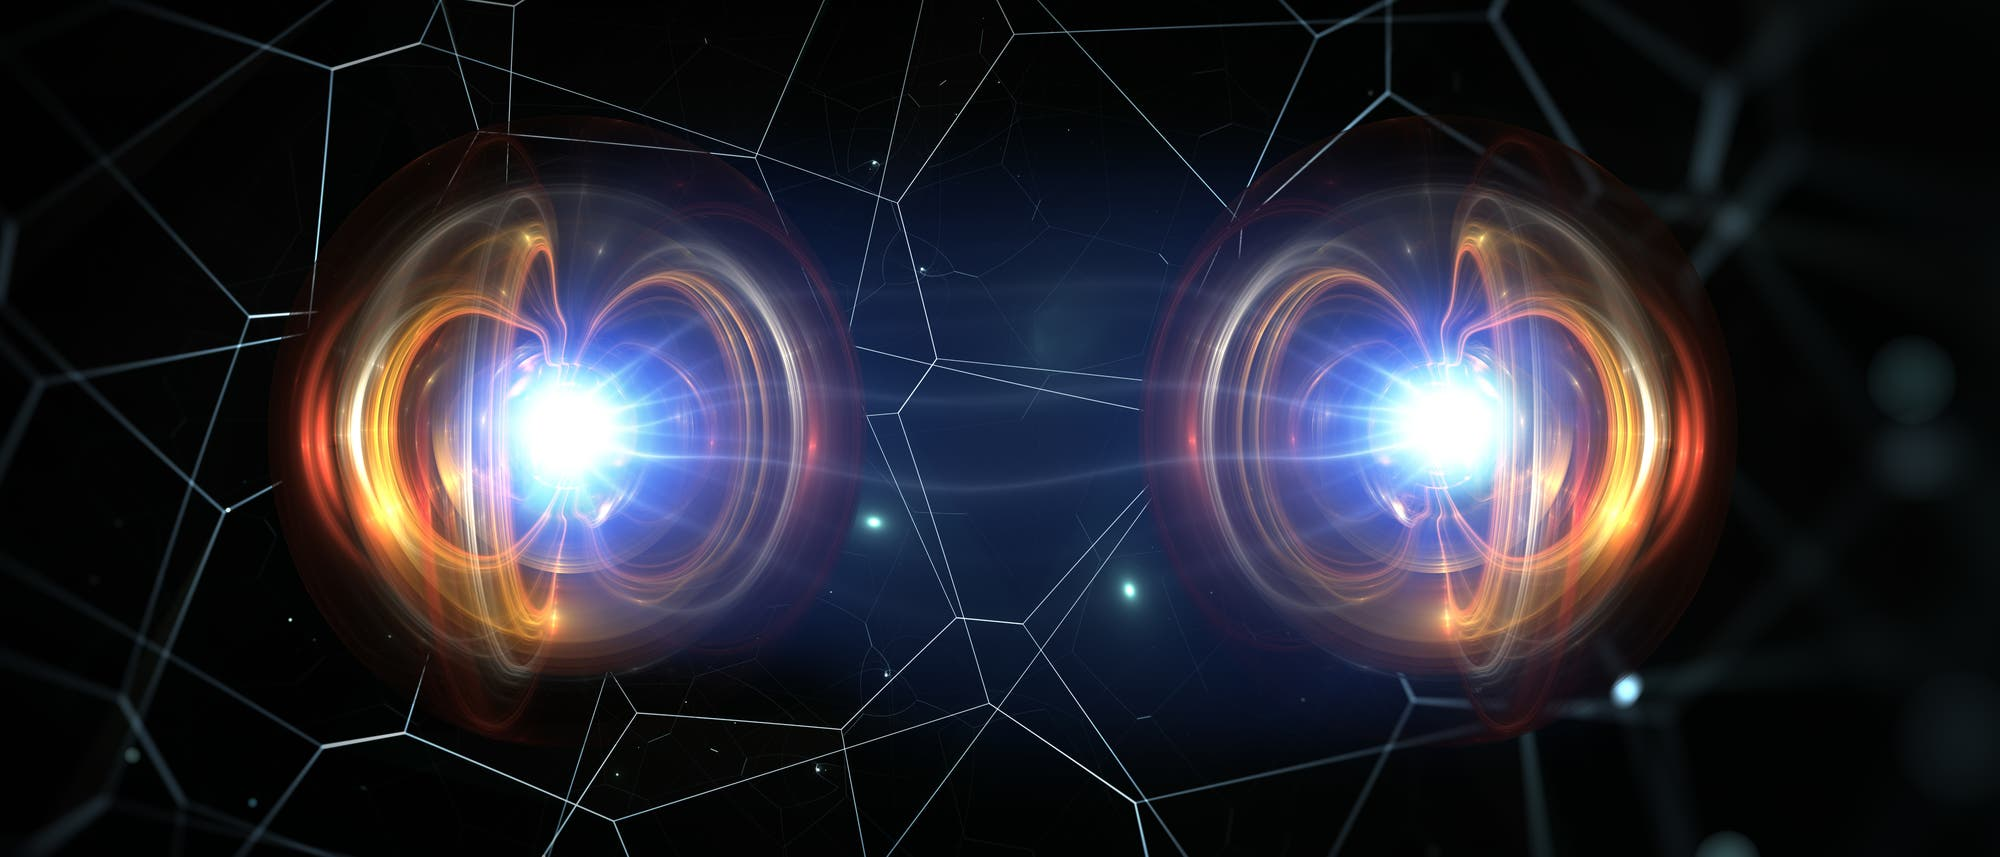 Zwei Quantenobjekte